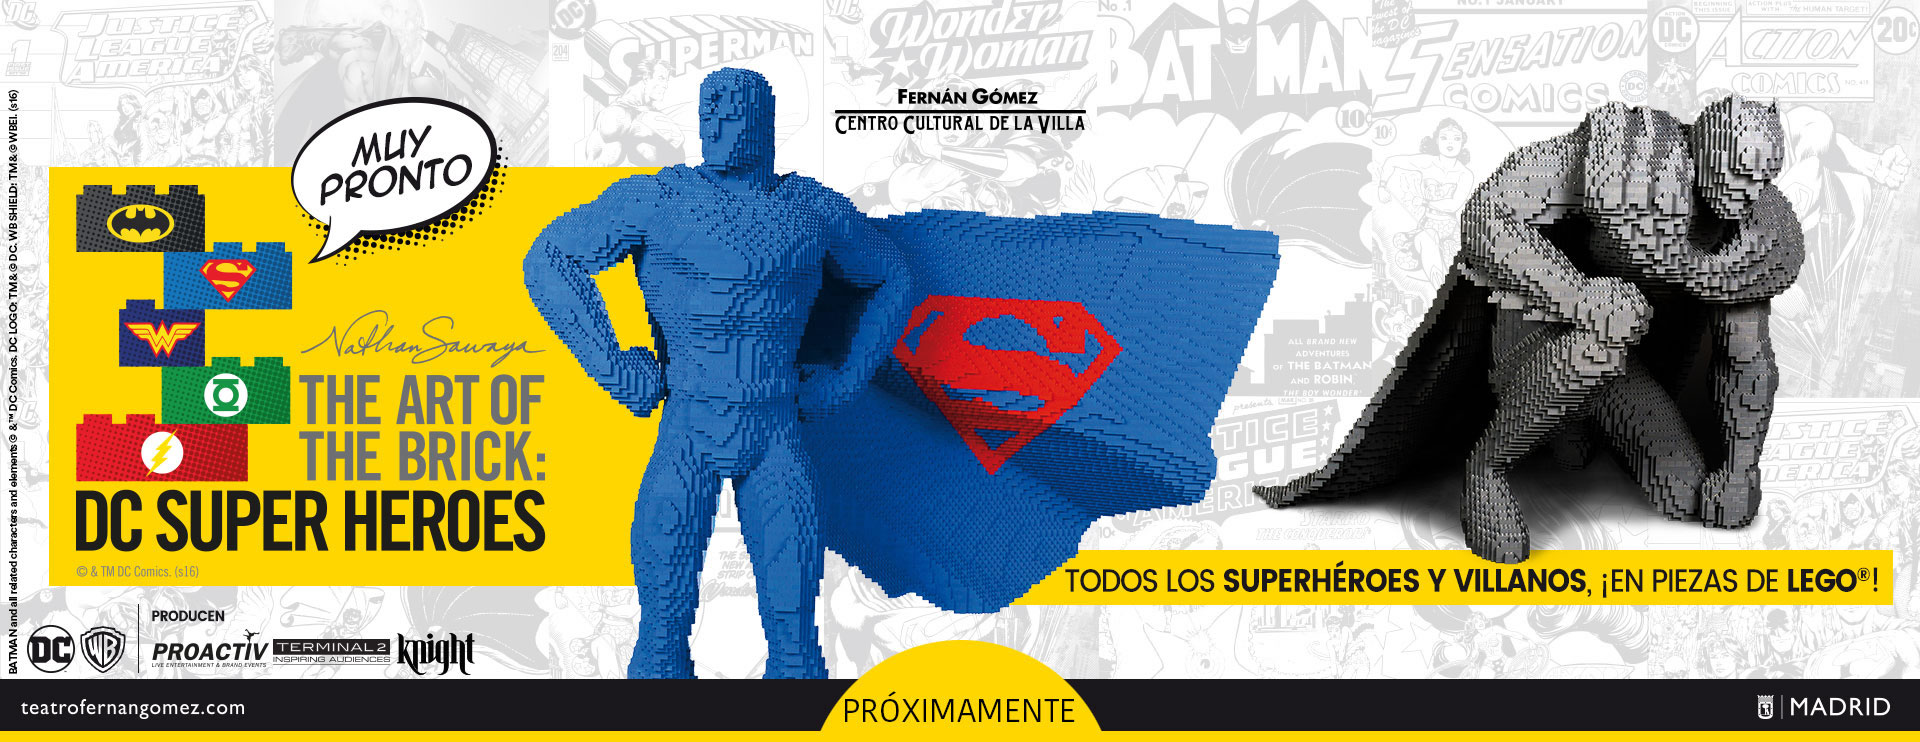 TAOTB - DC Super Heroes